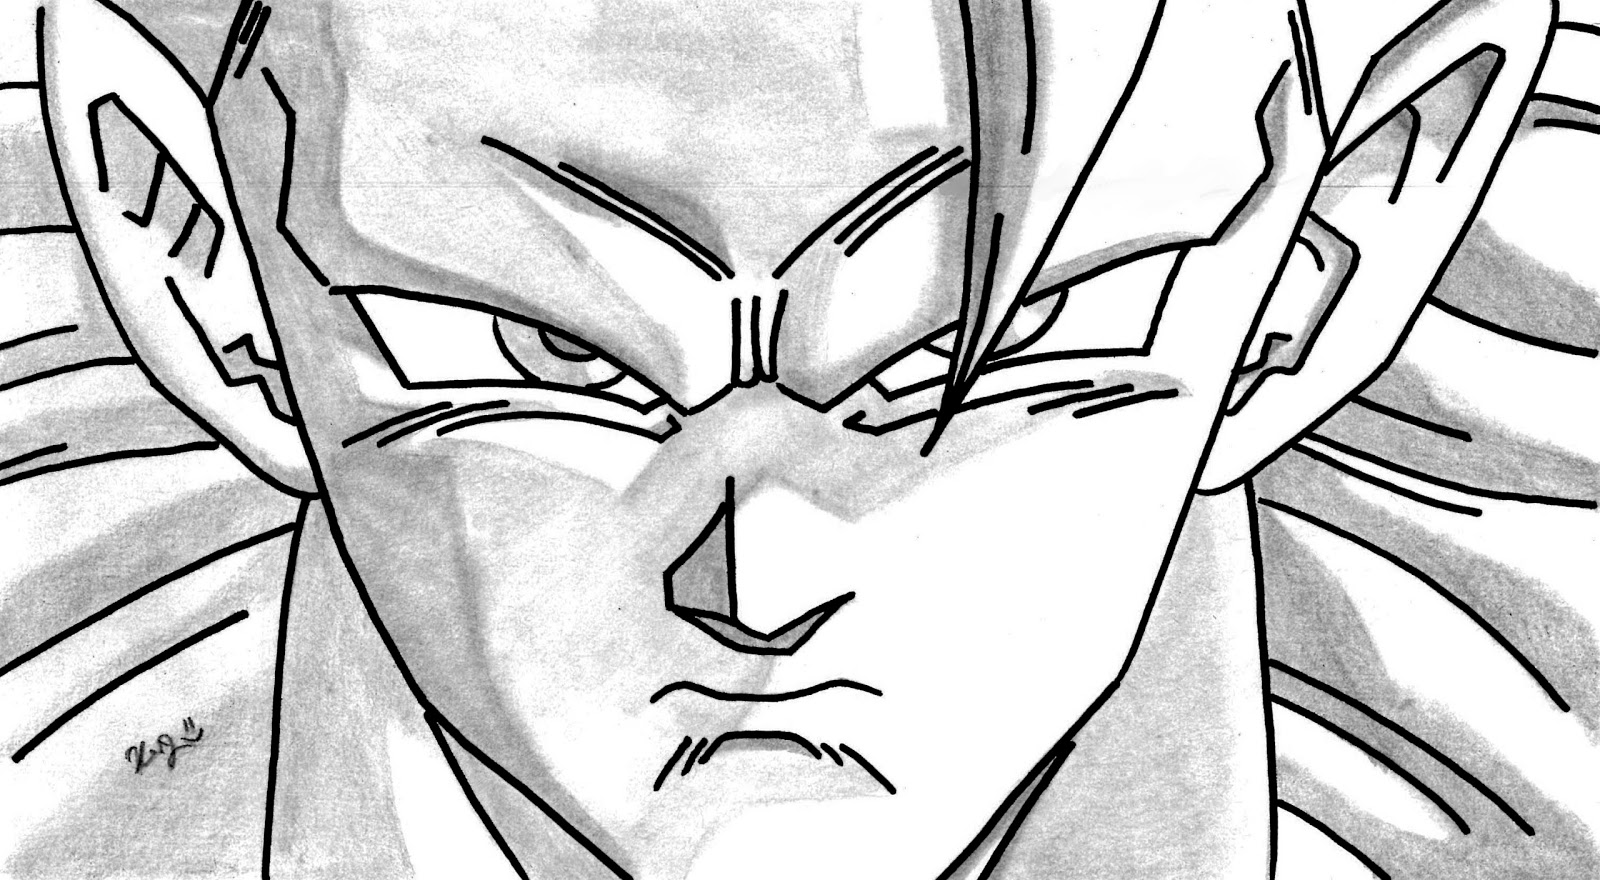 imagenesde99: imagenes de goku para dibujar a lapiz faciles